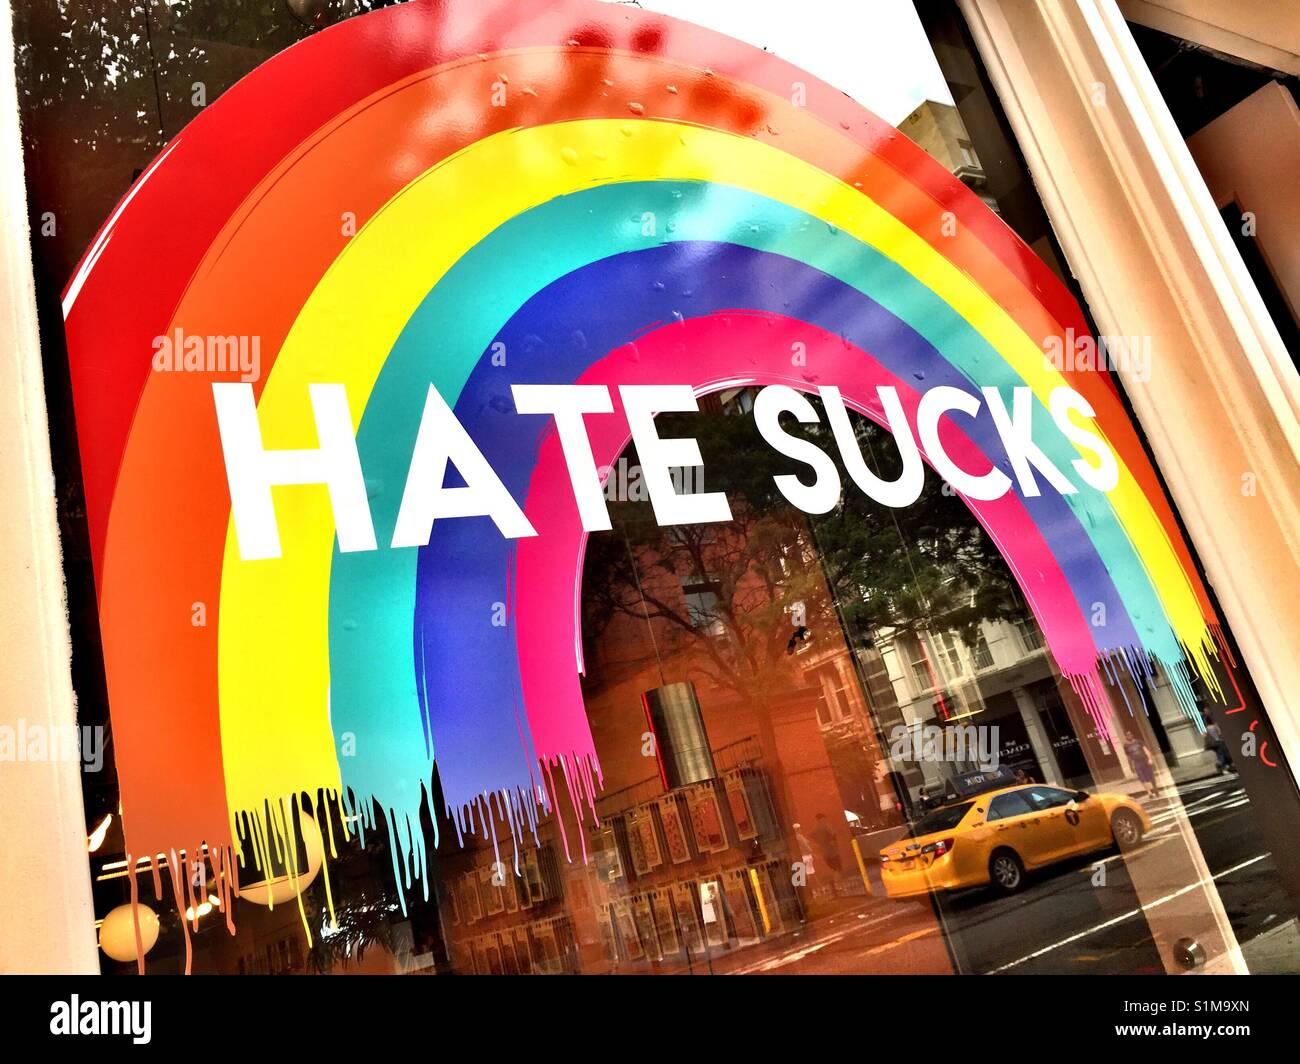 Hate sucks and rainbow sign on store window, NYC, USA - Stock Image